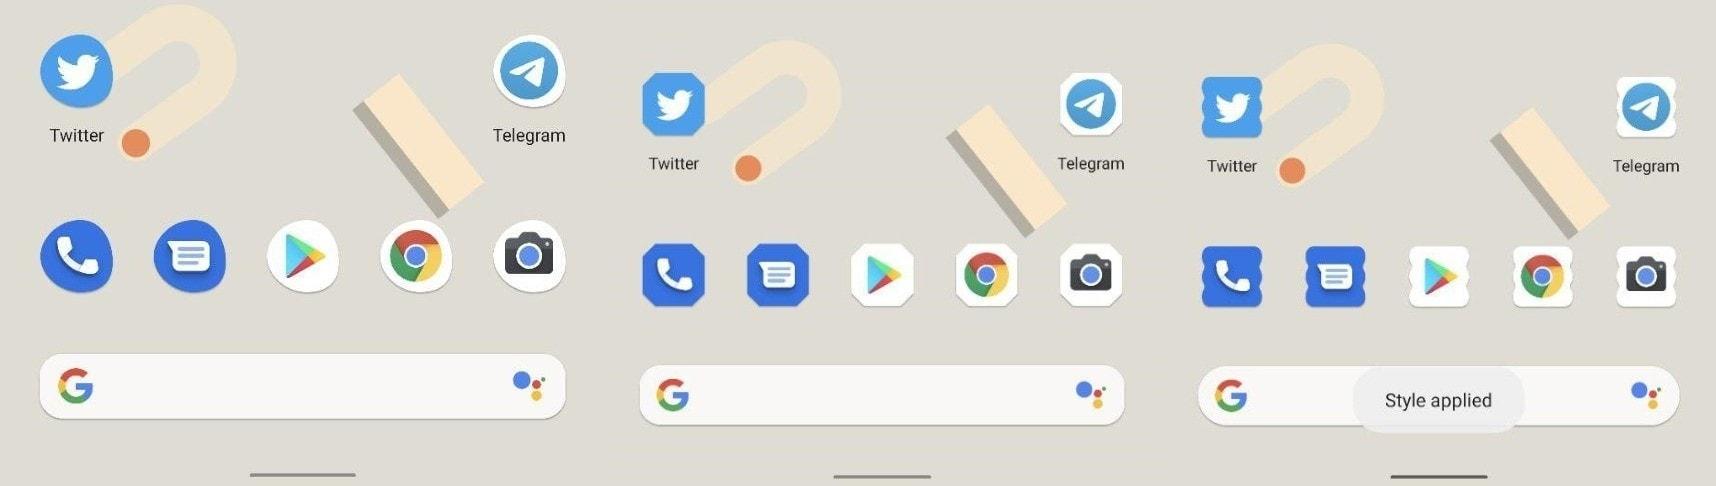 Новые иконки Android